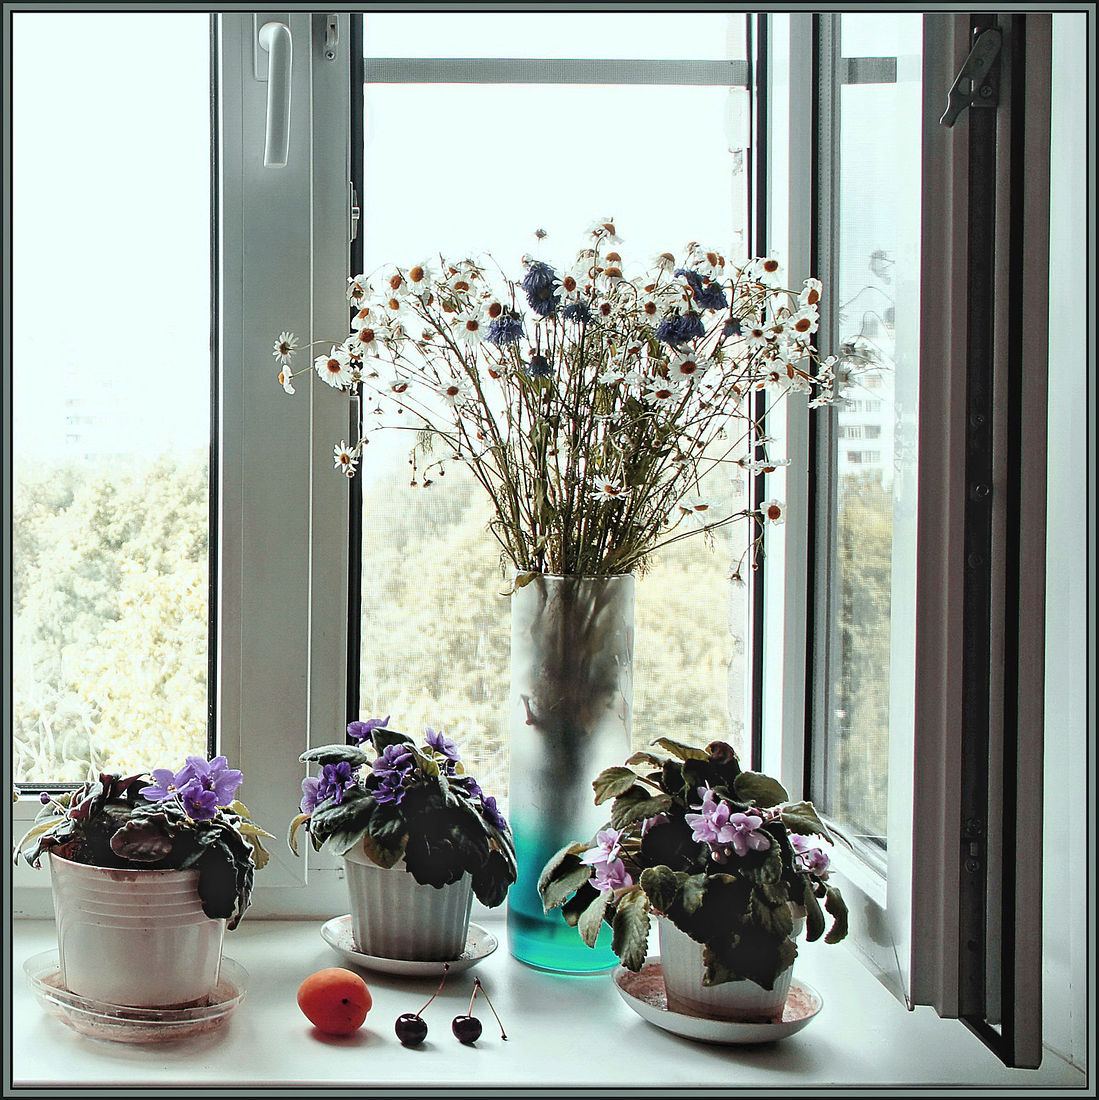 Елена Тарзиманова. Окно